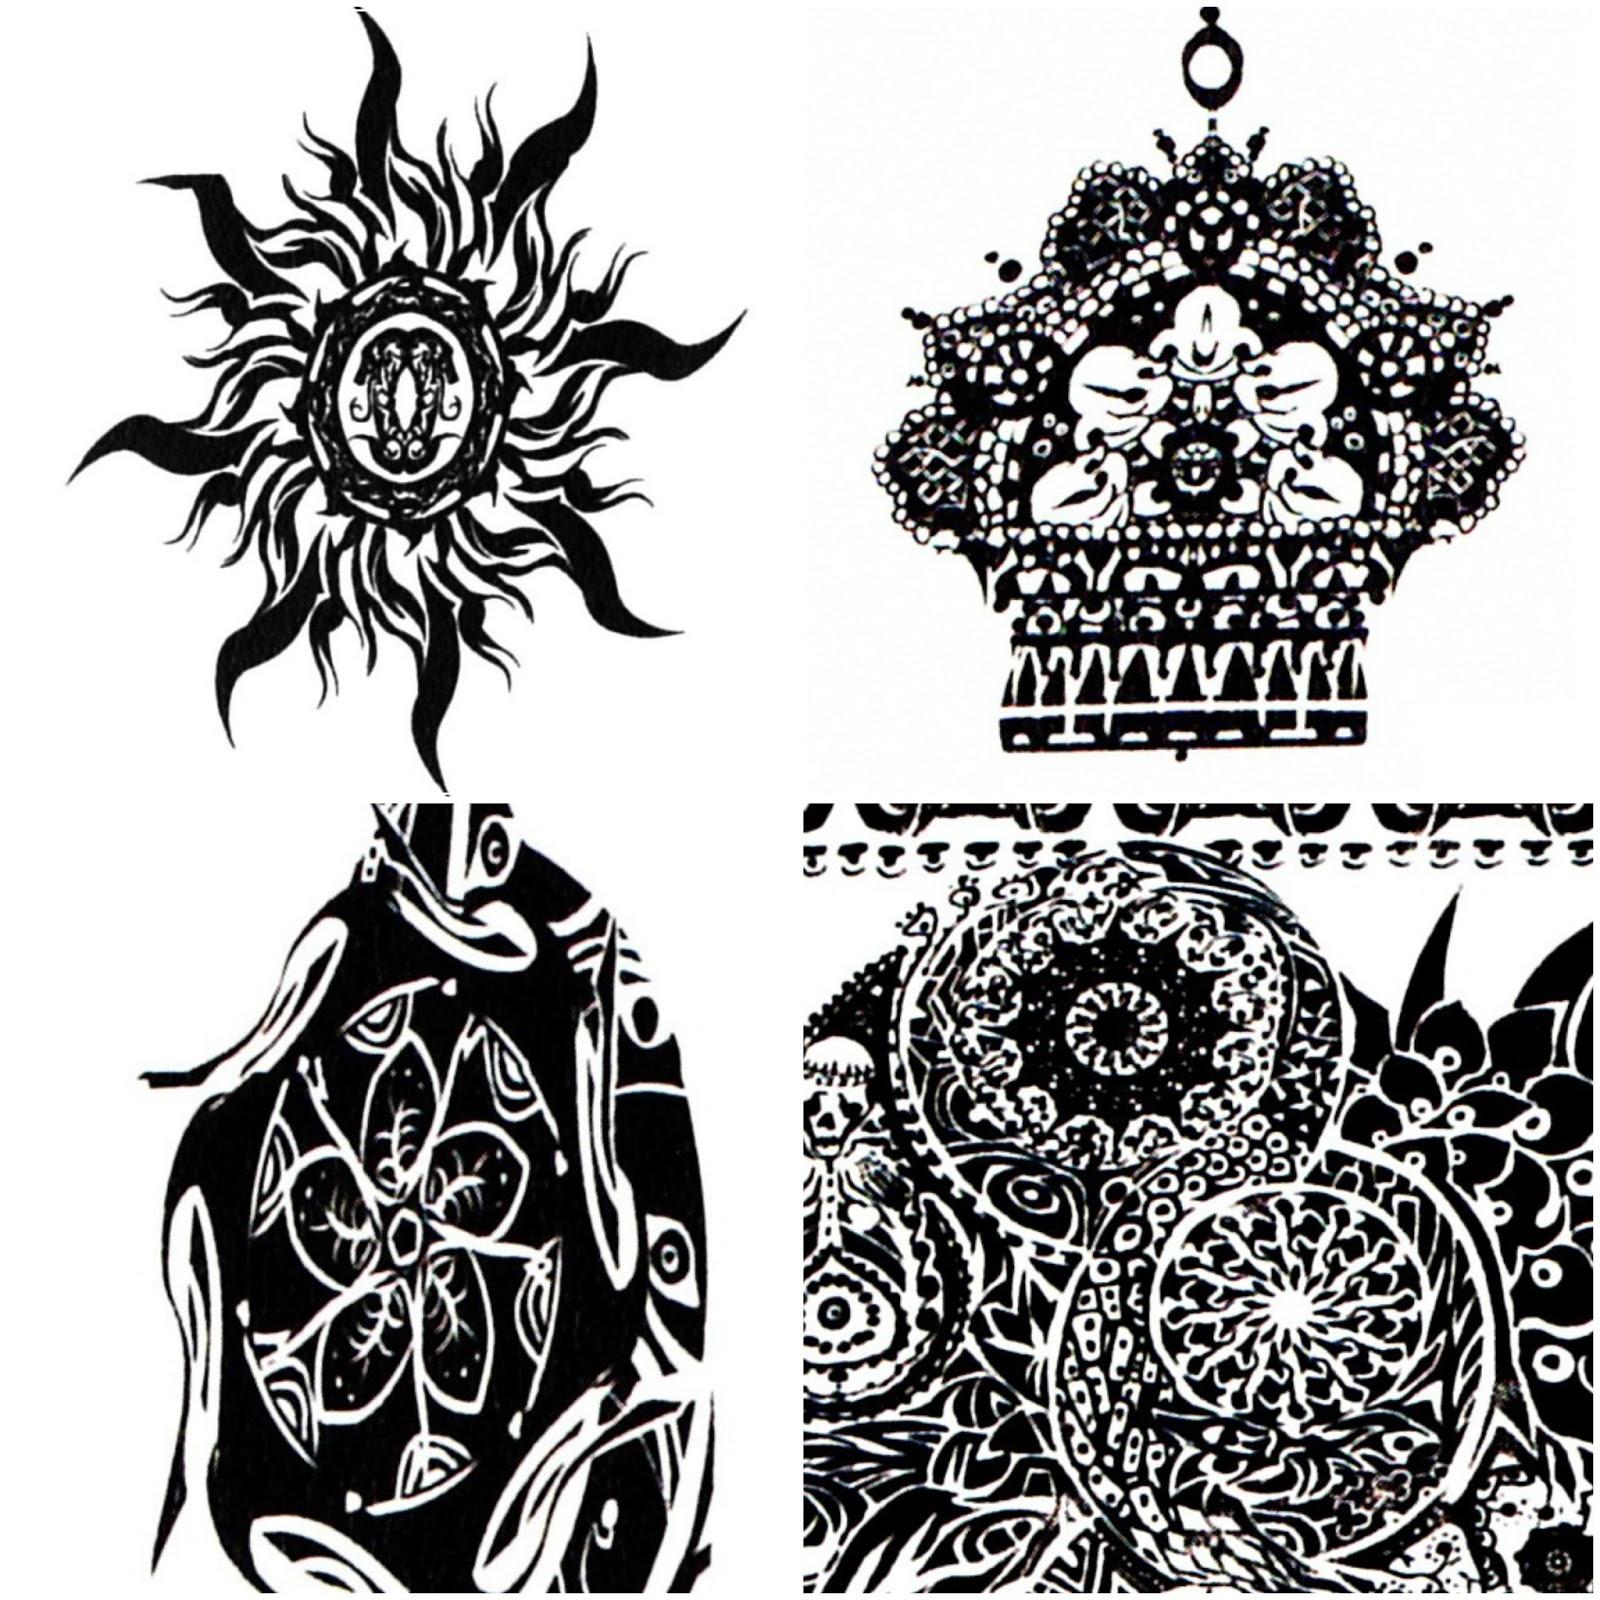 The clown king utas flower tattoos part 1 utas flower tattoos part 1 izmirmasajfo